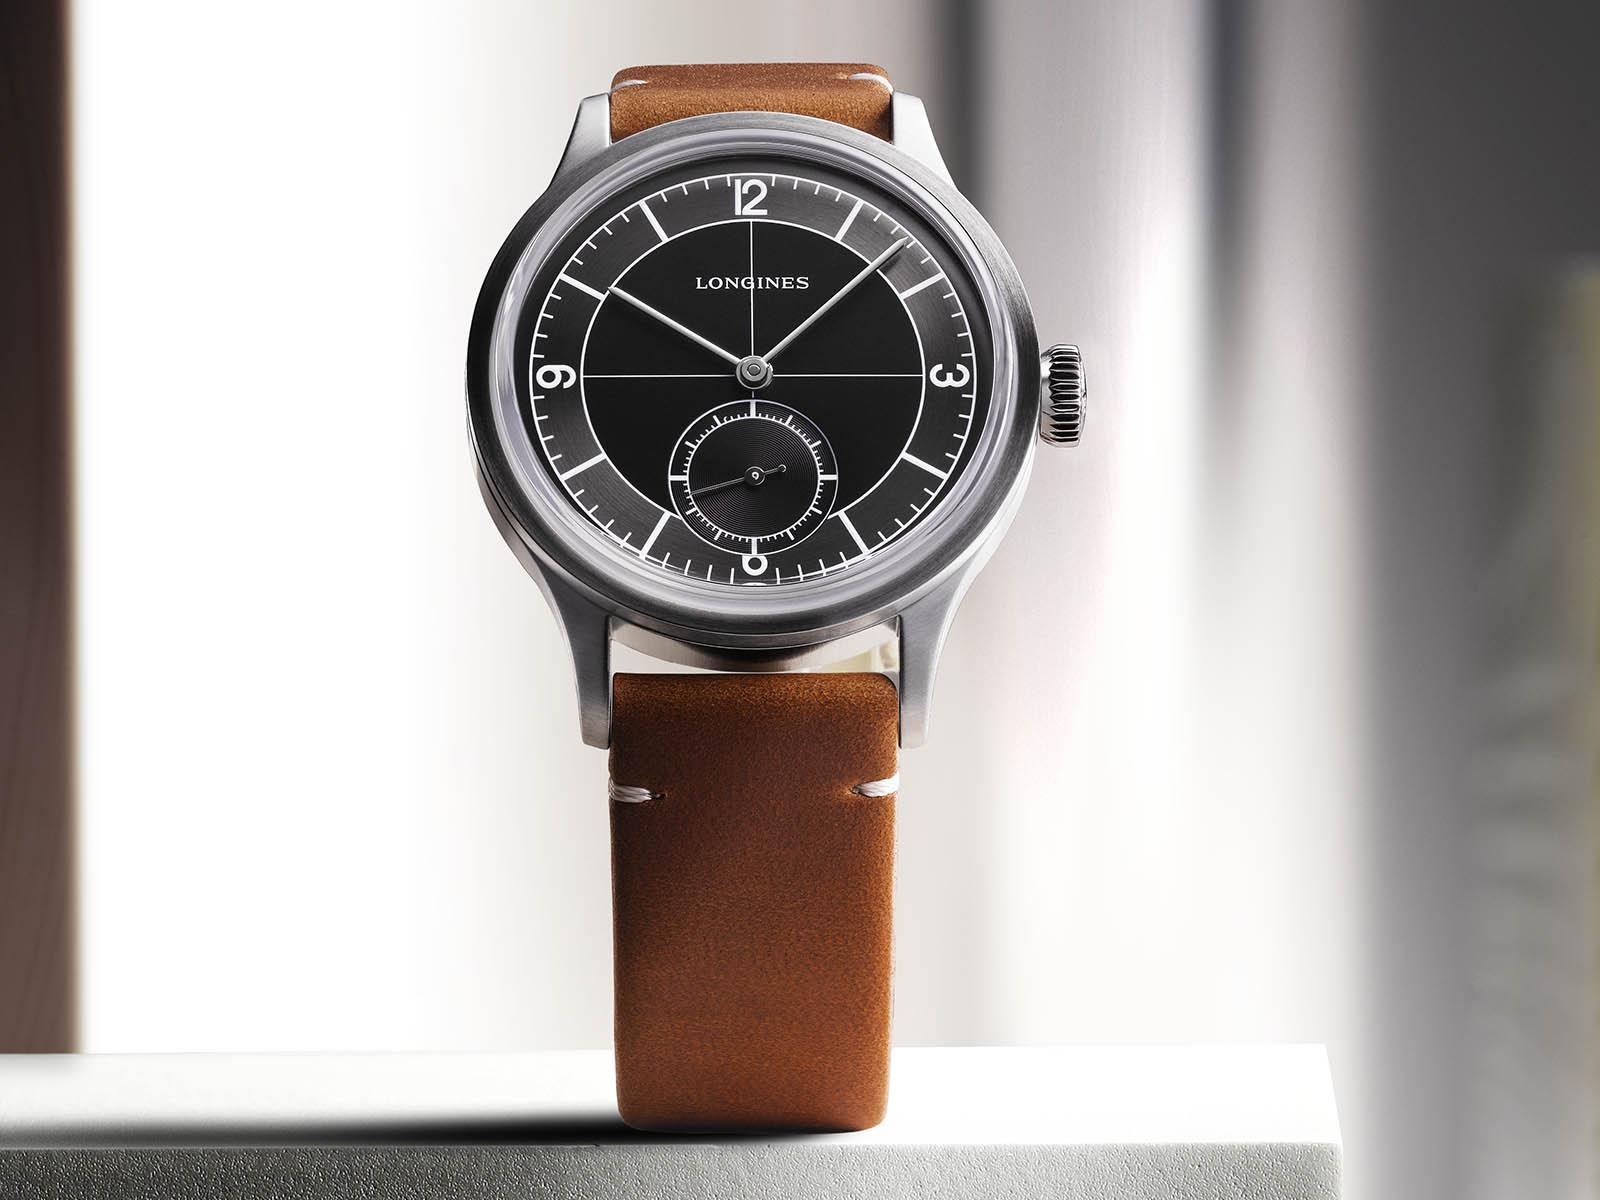 l2-828-4-53-2-longines-heritage-classic-black-dial-1.jpg